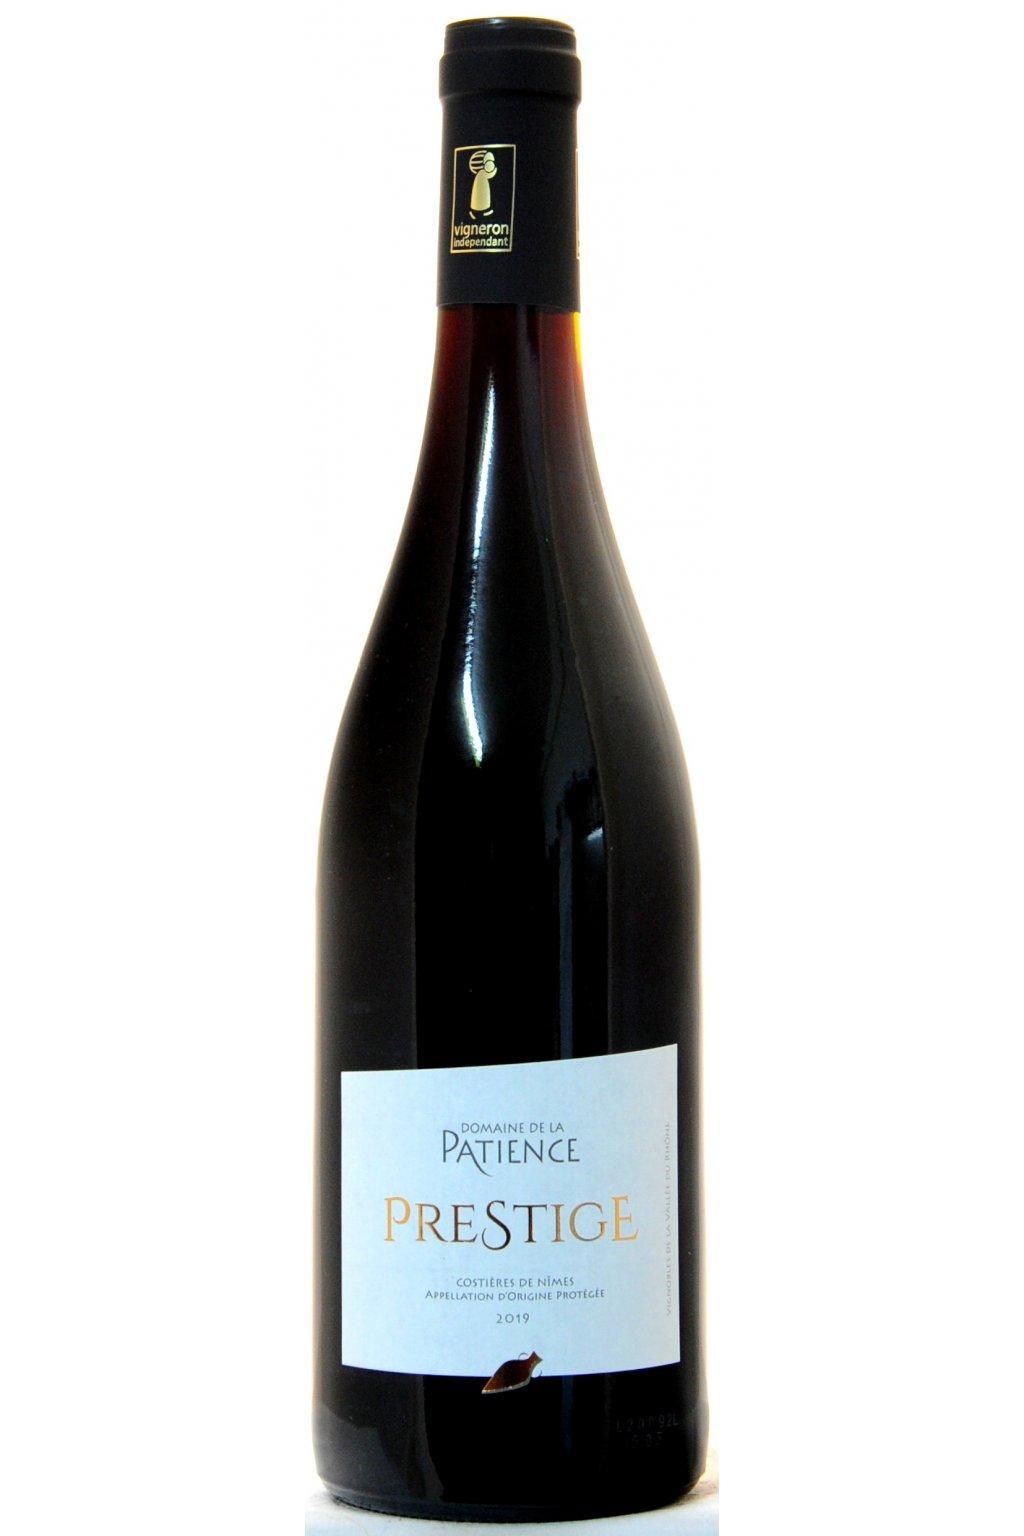 PATIENCE AOPCostieres de Nimes rouge Cuvee Prestige 2019 F